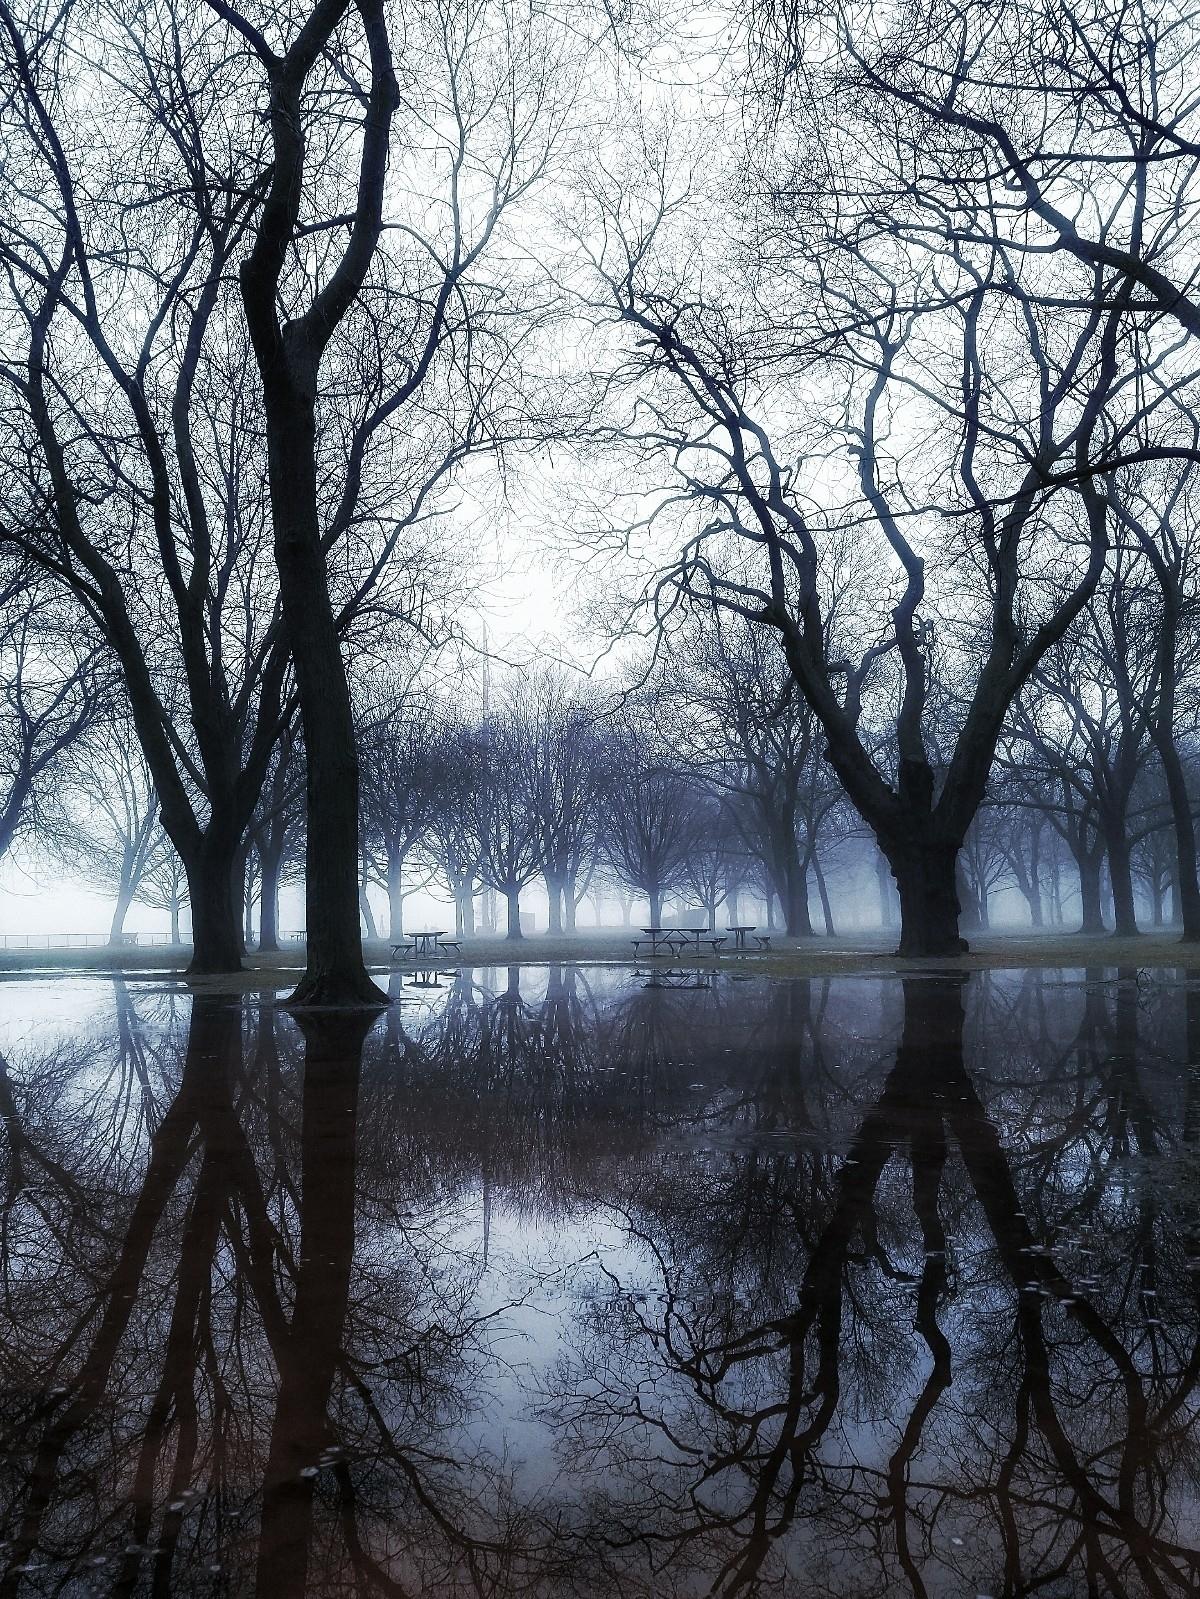 Silent Hill photo reminded Vide - dewucme | ello